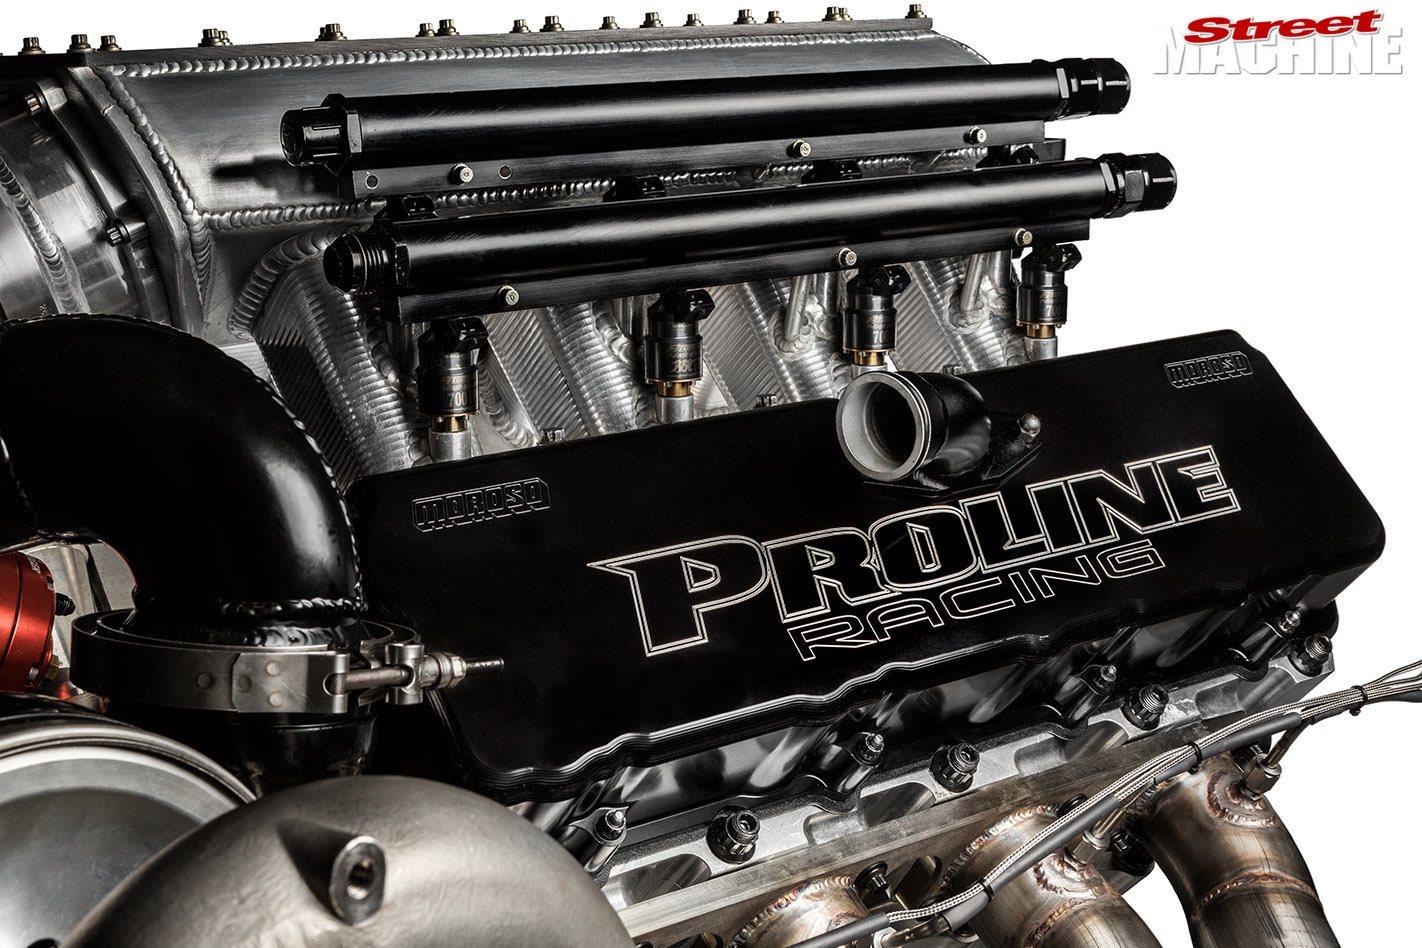 Steve Bezzina's 540ci Pro Line 481X - Mill of the Month